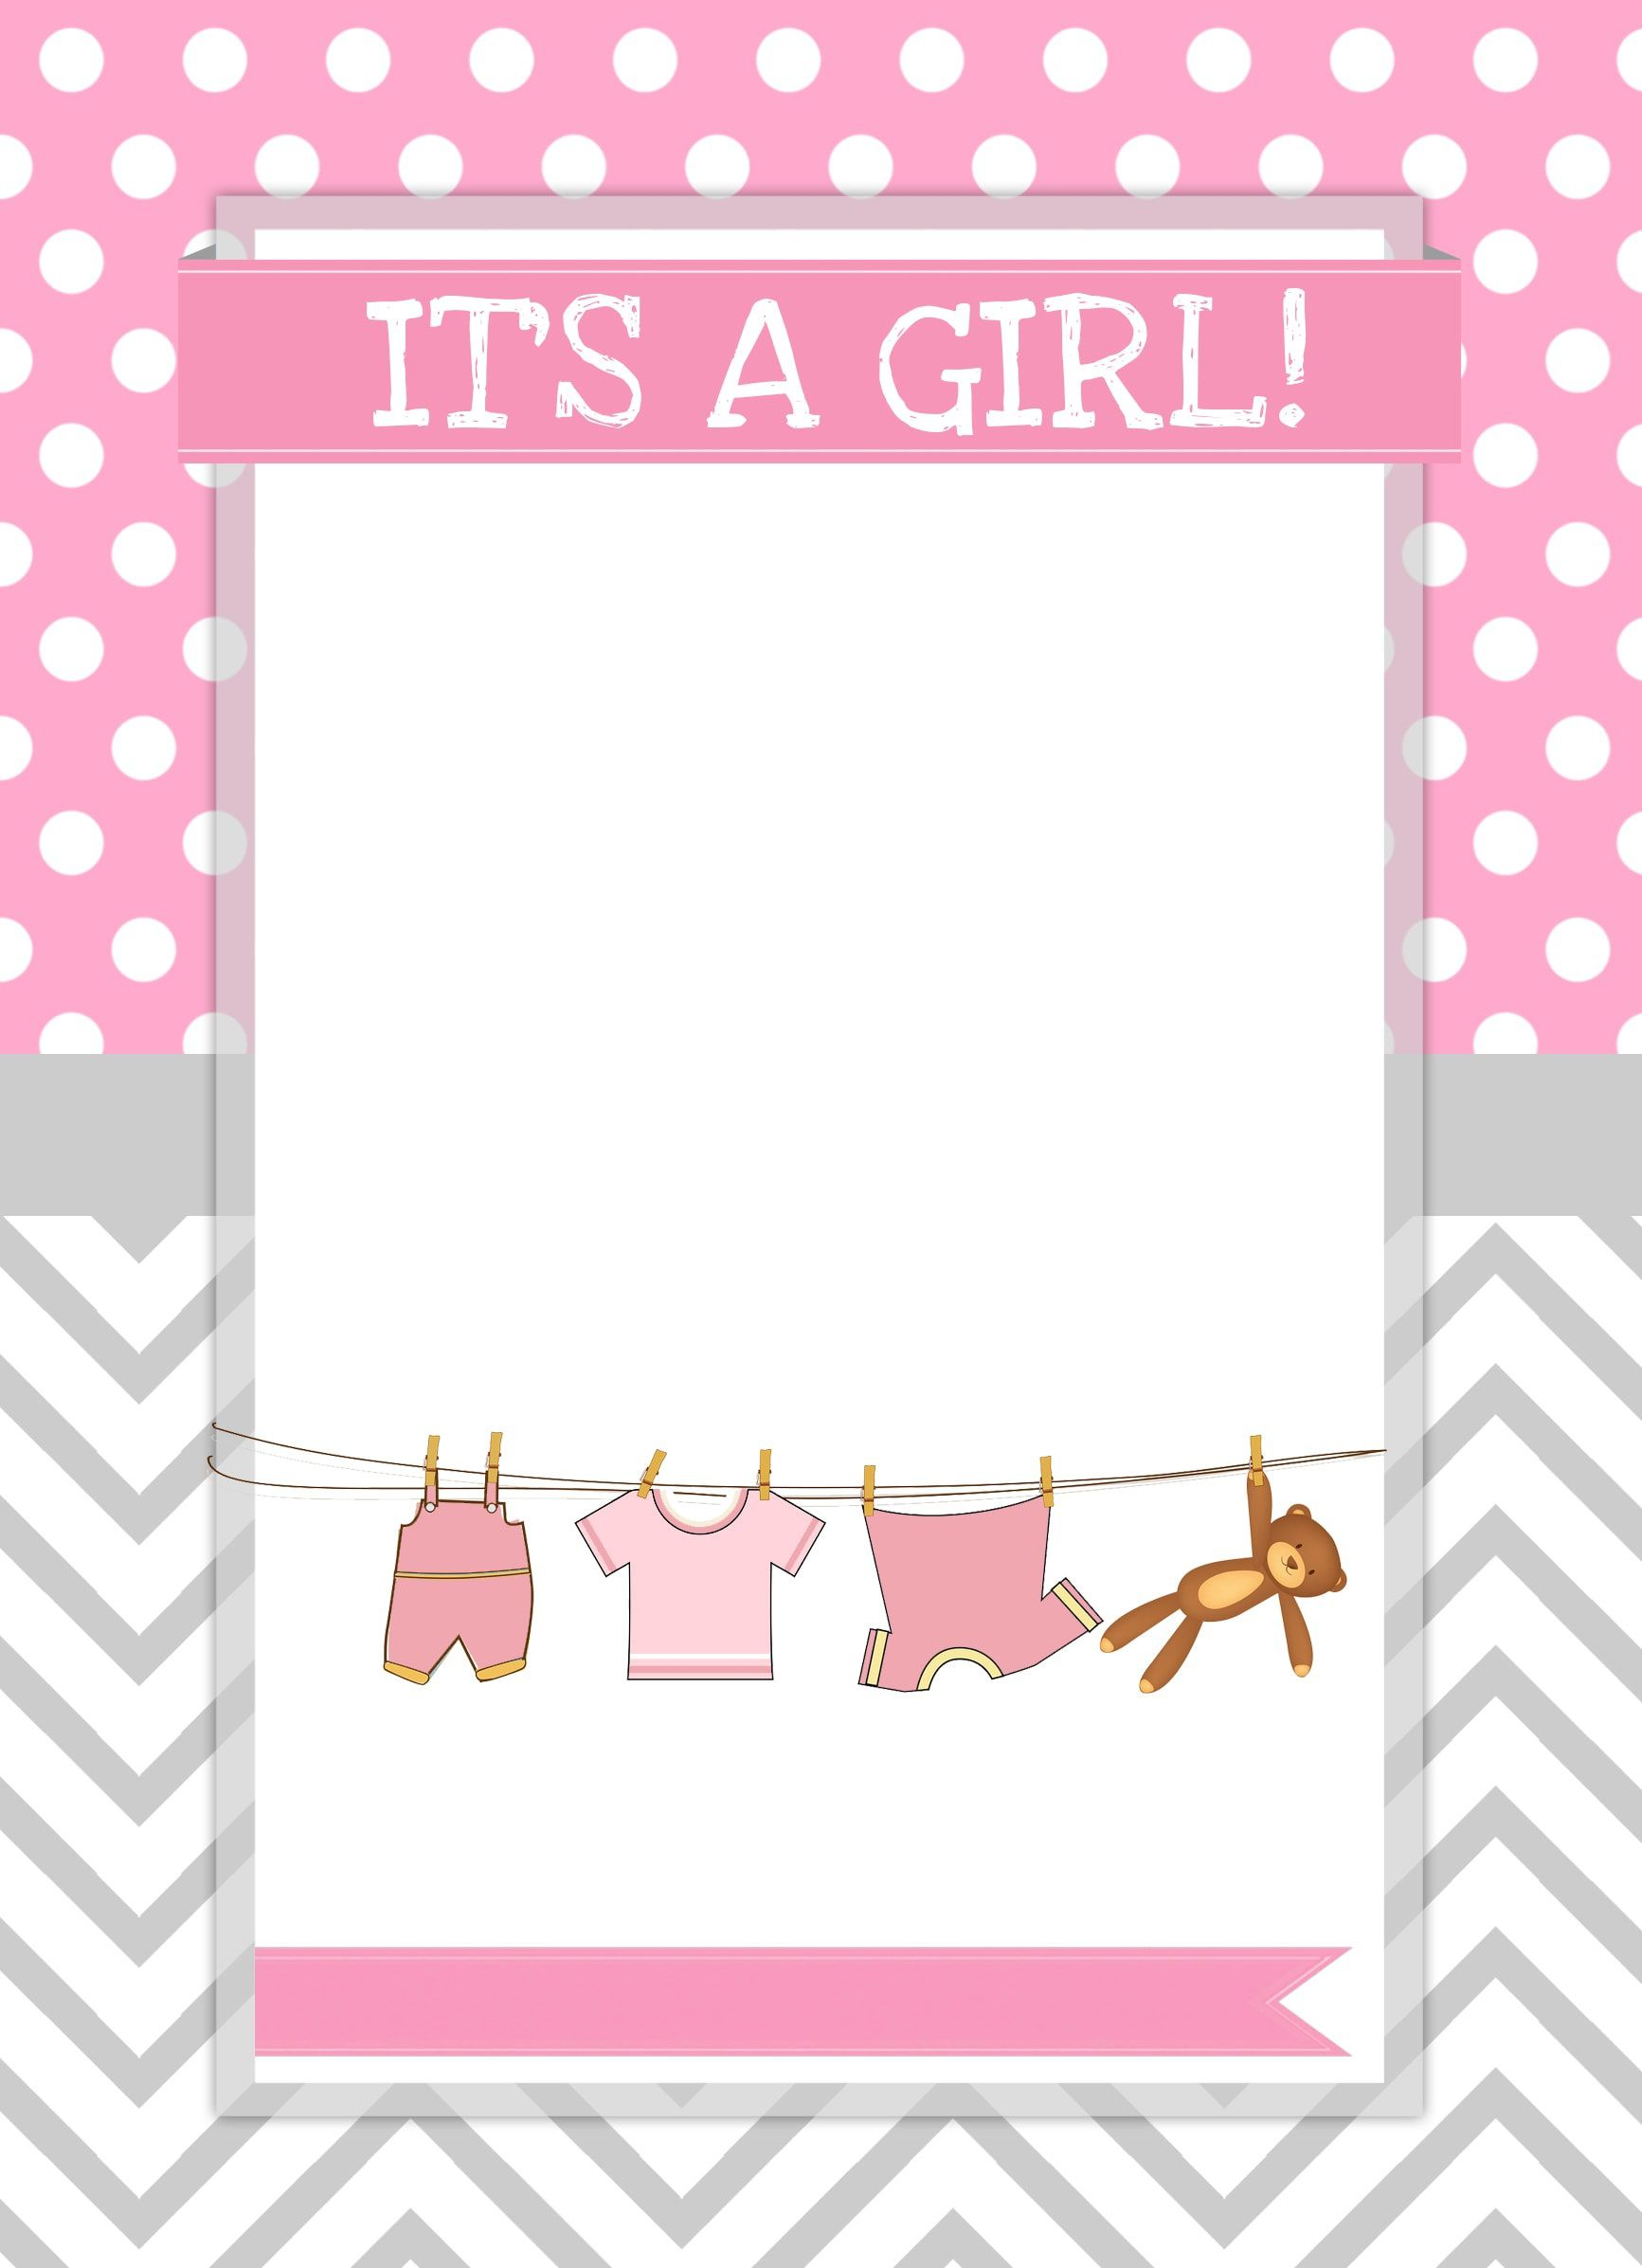 002 Unusual Baby Shower Printable Girl Inspiration  Sheet Cake Cute For AFull